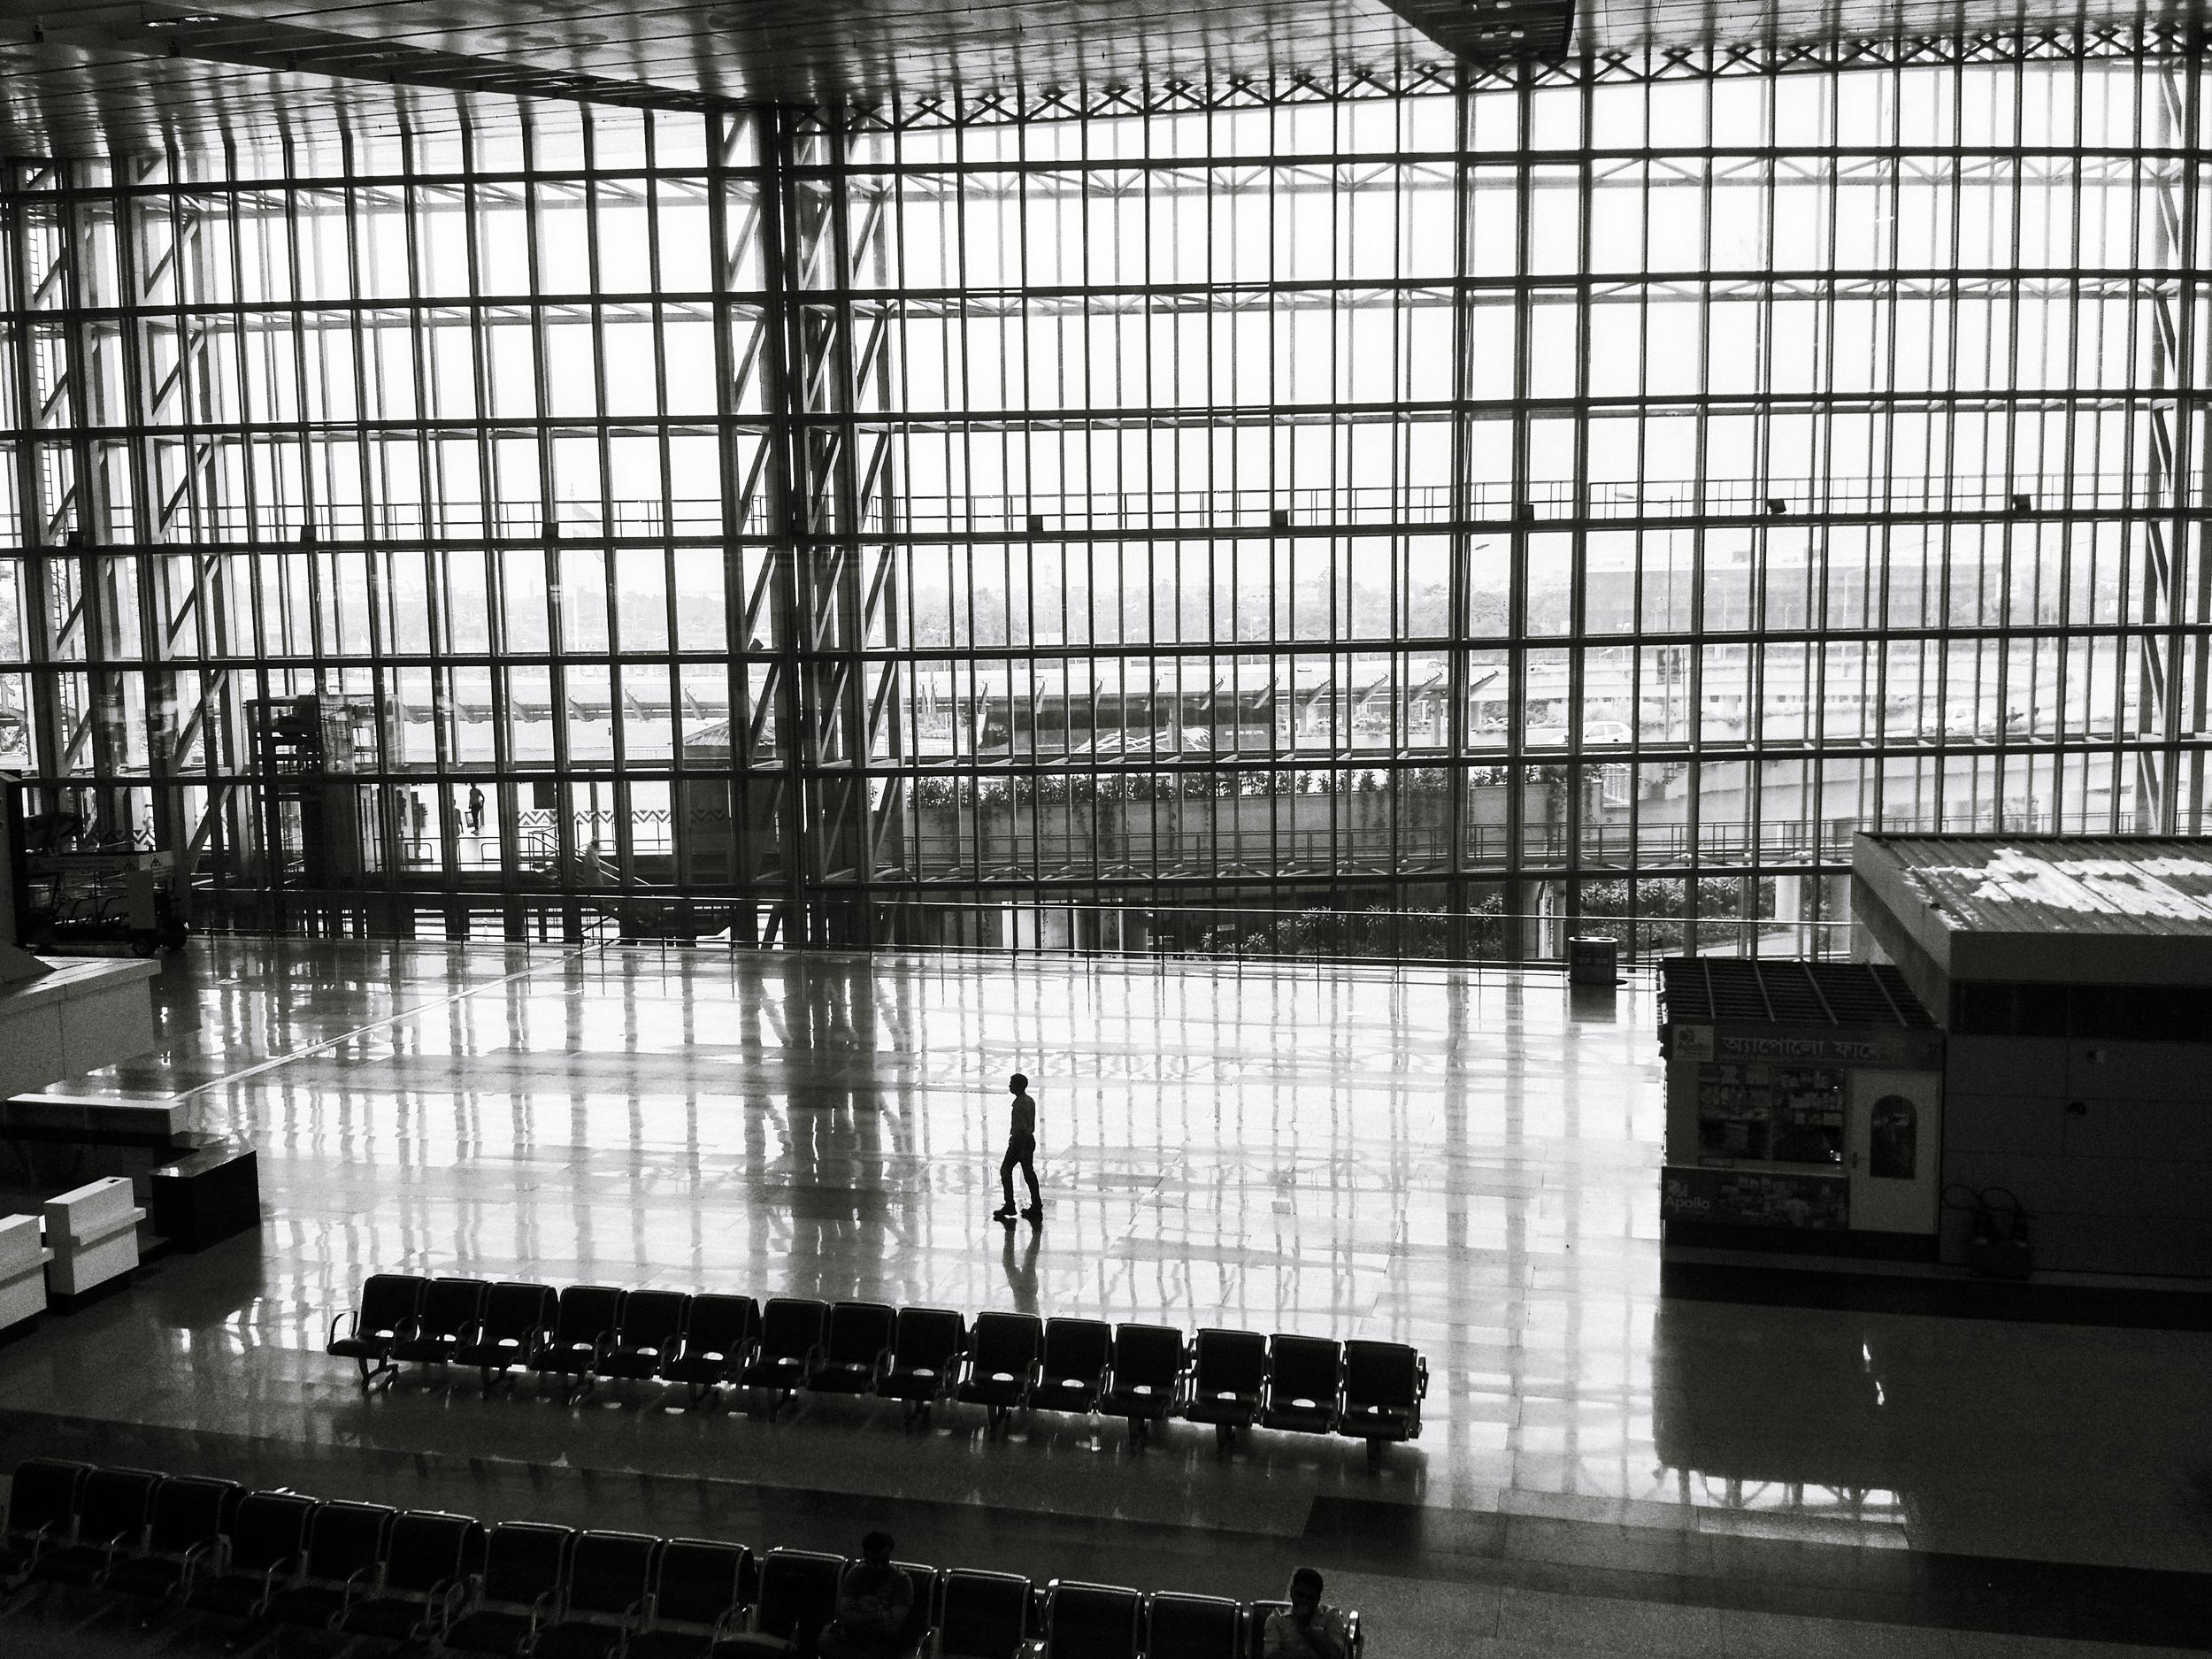 Kolkata airport I believe.